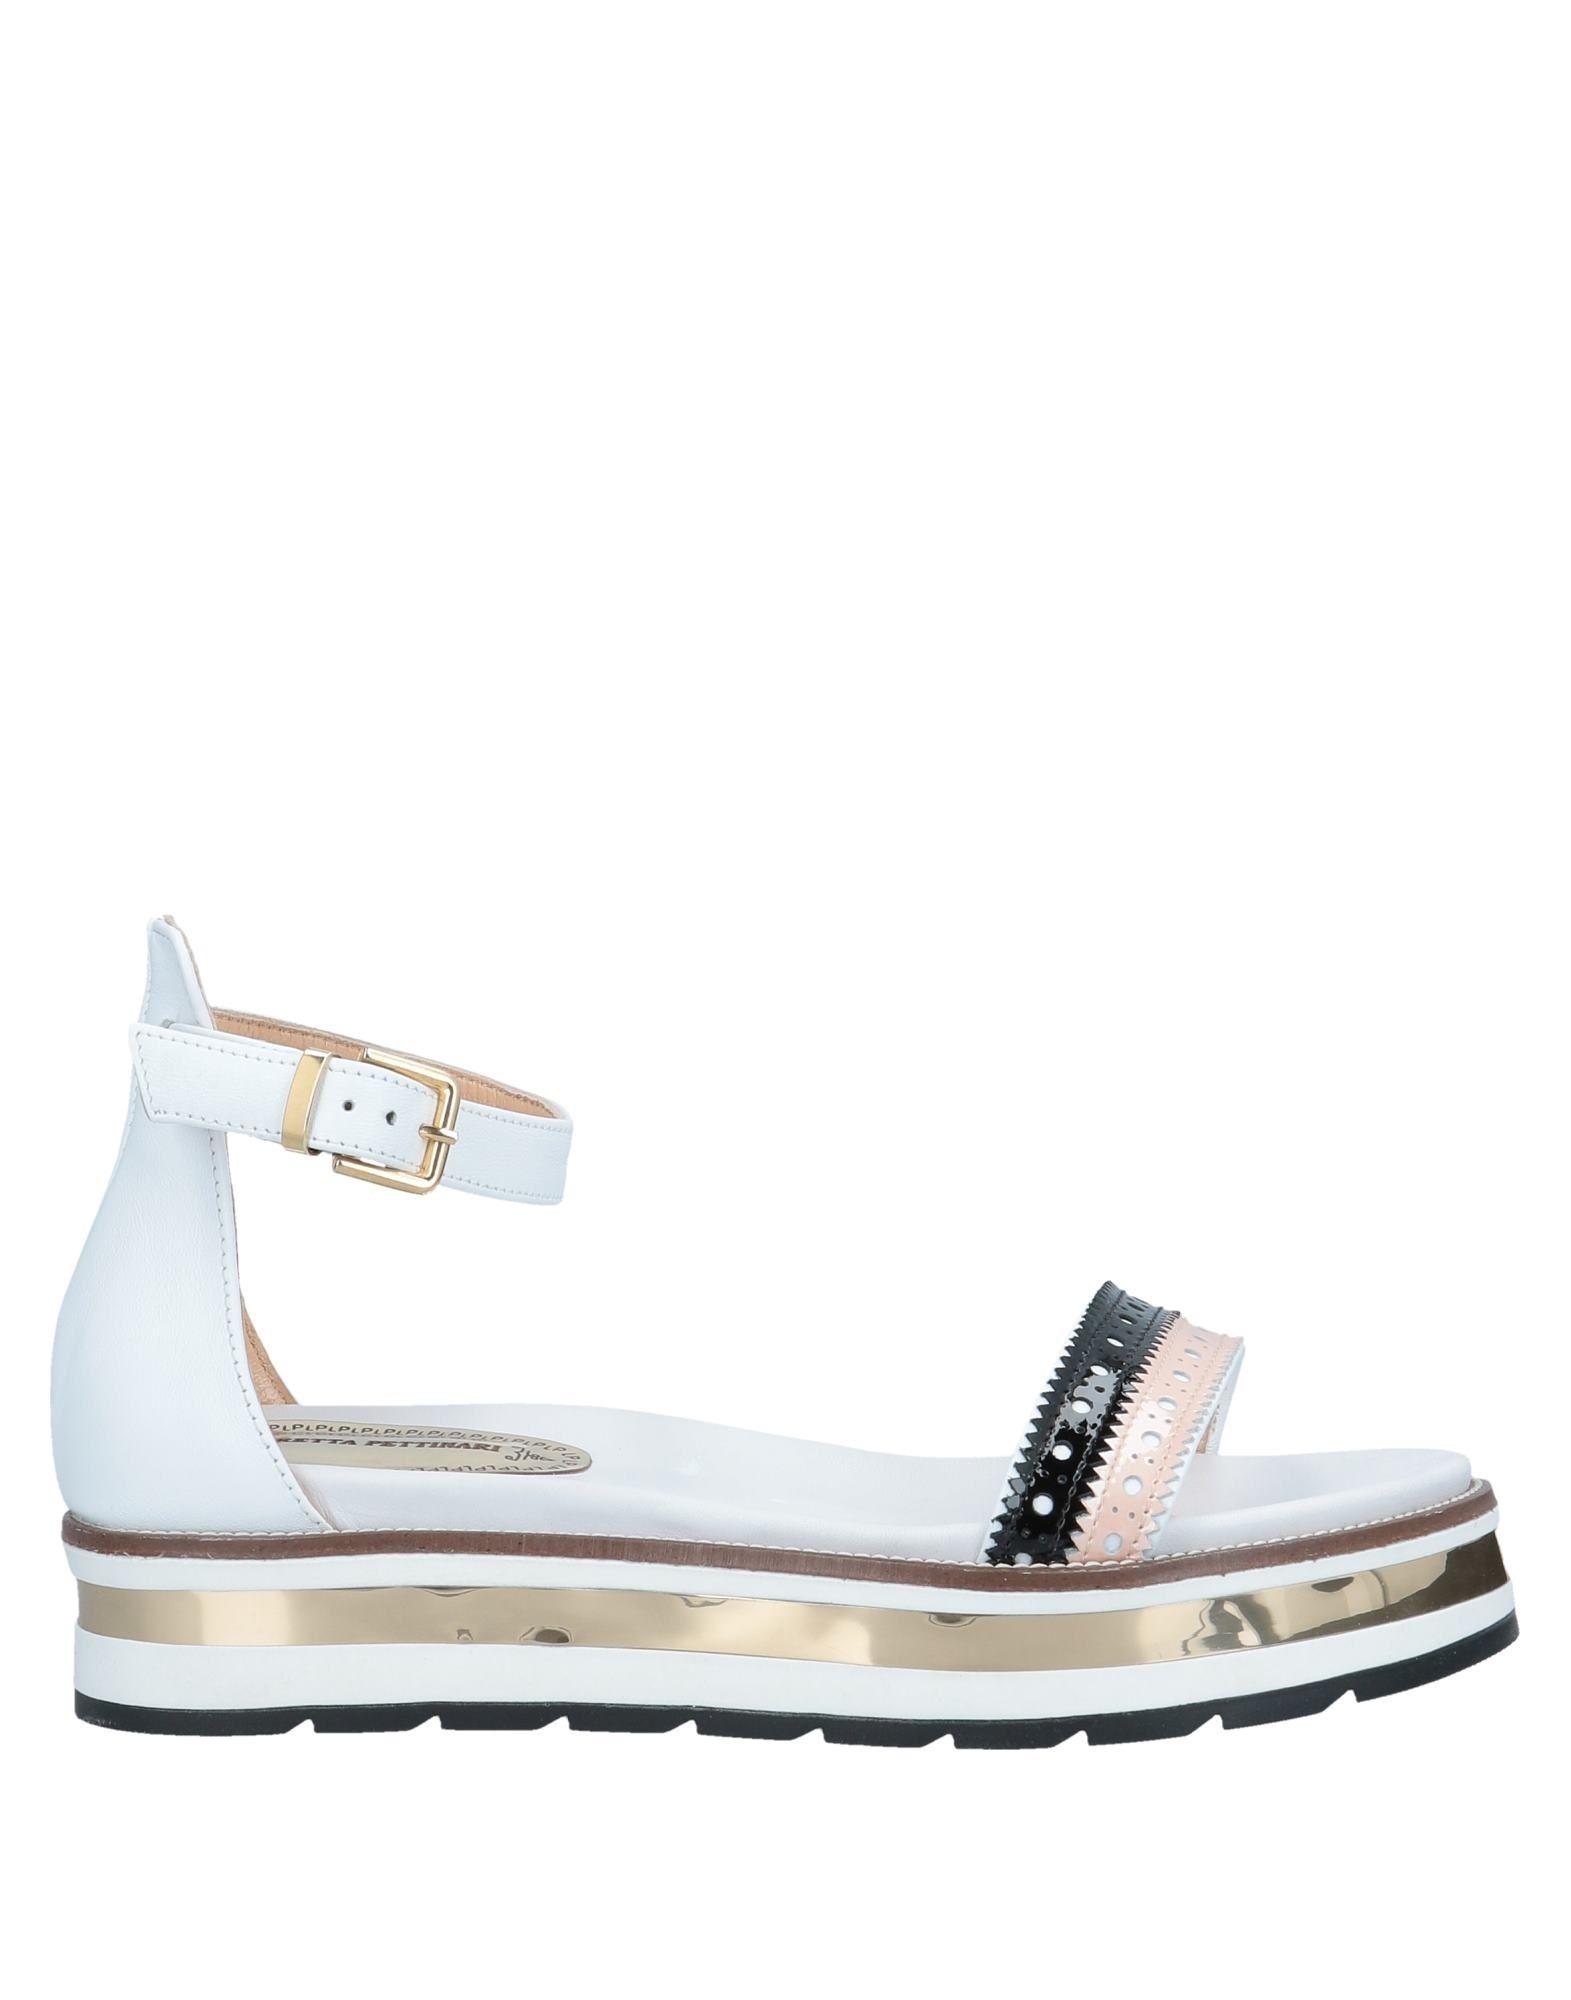 Loretta Pettinari Sandalen Damen  11550121QL Gute Qualität beliebte Schuhe